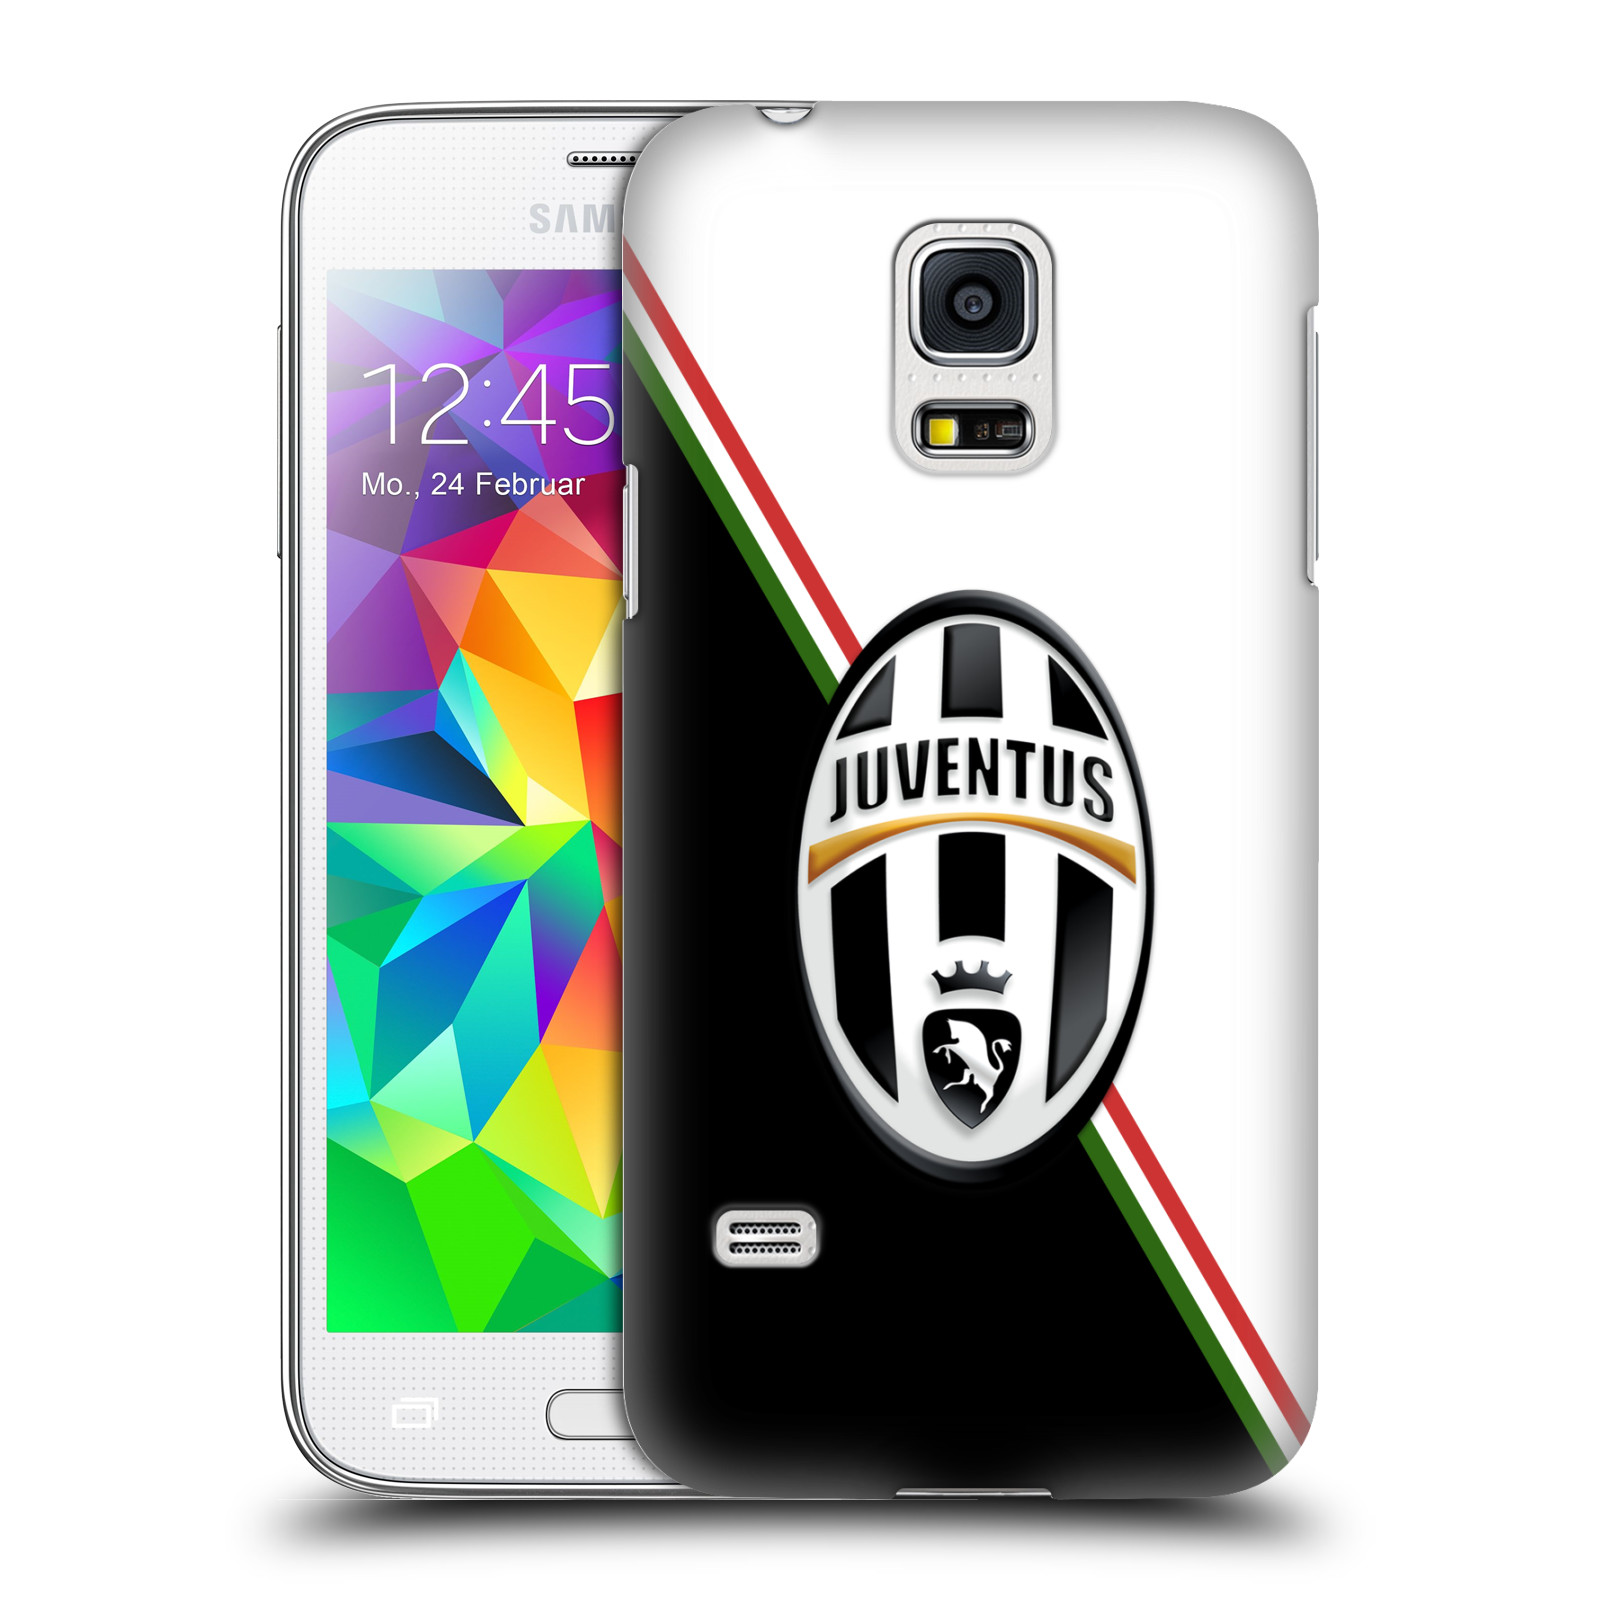 Plastové pouzdro na mobil Samsung Galaxy S5 Mini HEAD CASE Juventus FC - Black and White (Plastový kryt či obal na mobilní telefon Juventus FC Official pro Samsung Galaxy S5 Mini SM-G800F)